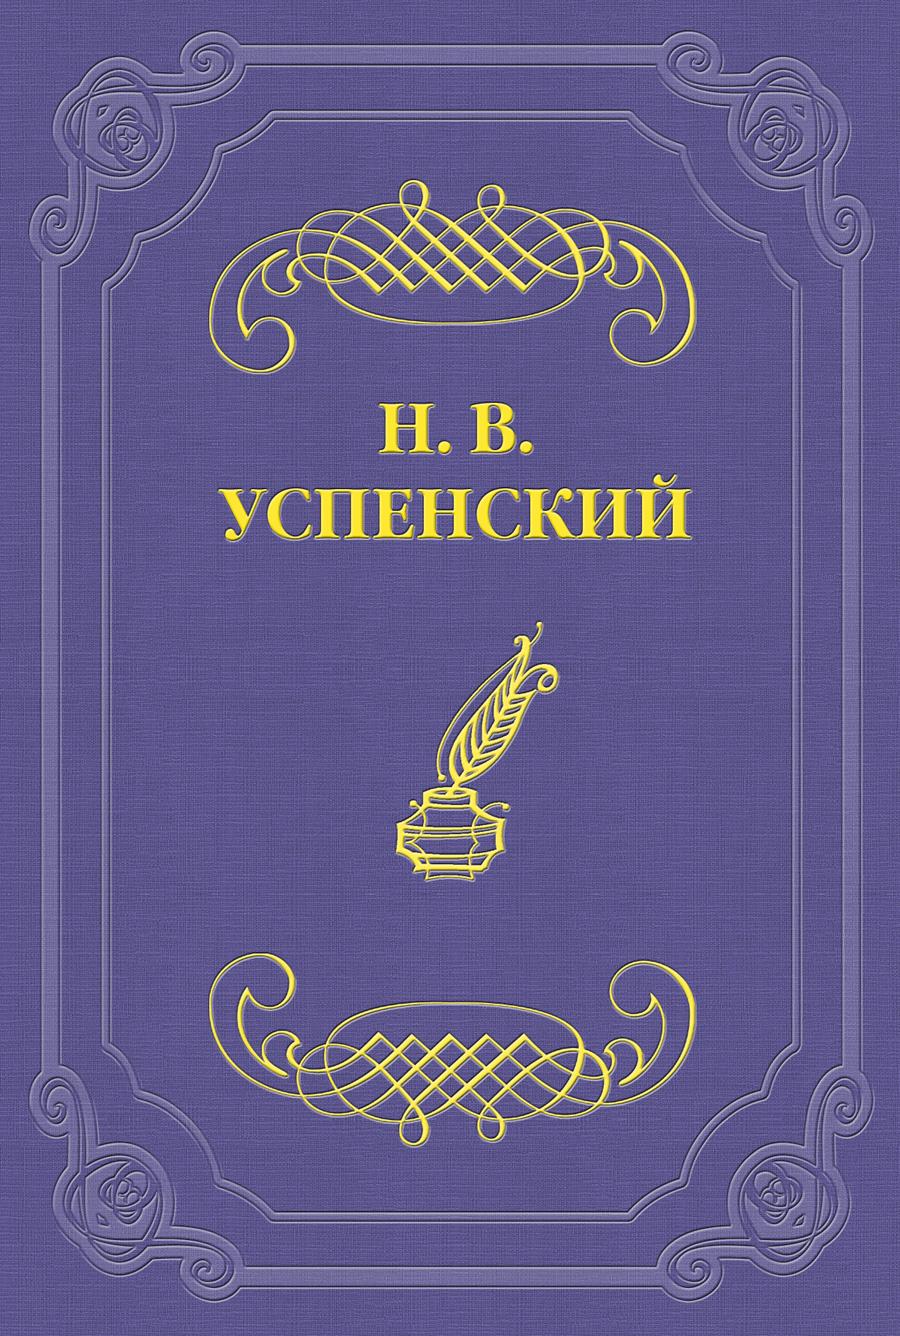 Николай Васильевич Успенский Брусилов николай трушин заметки провинциального журналиста